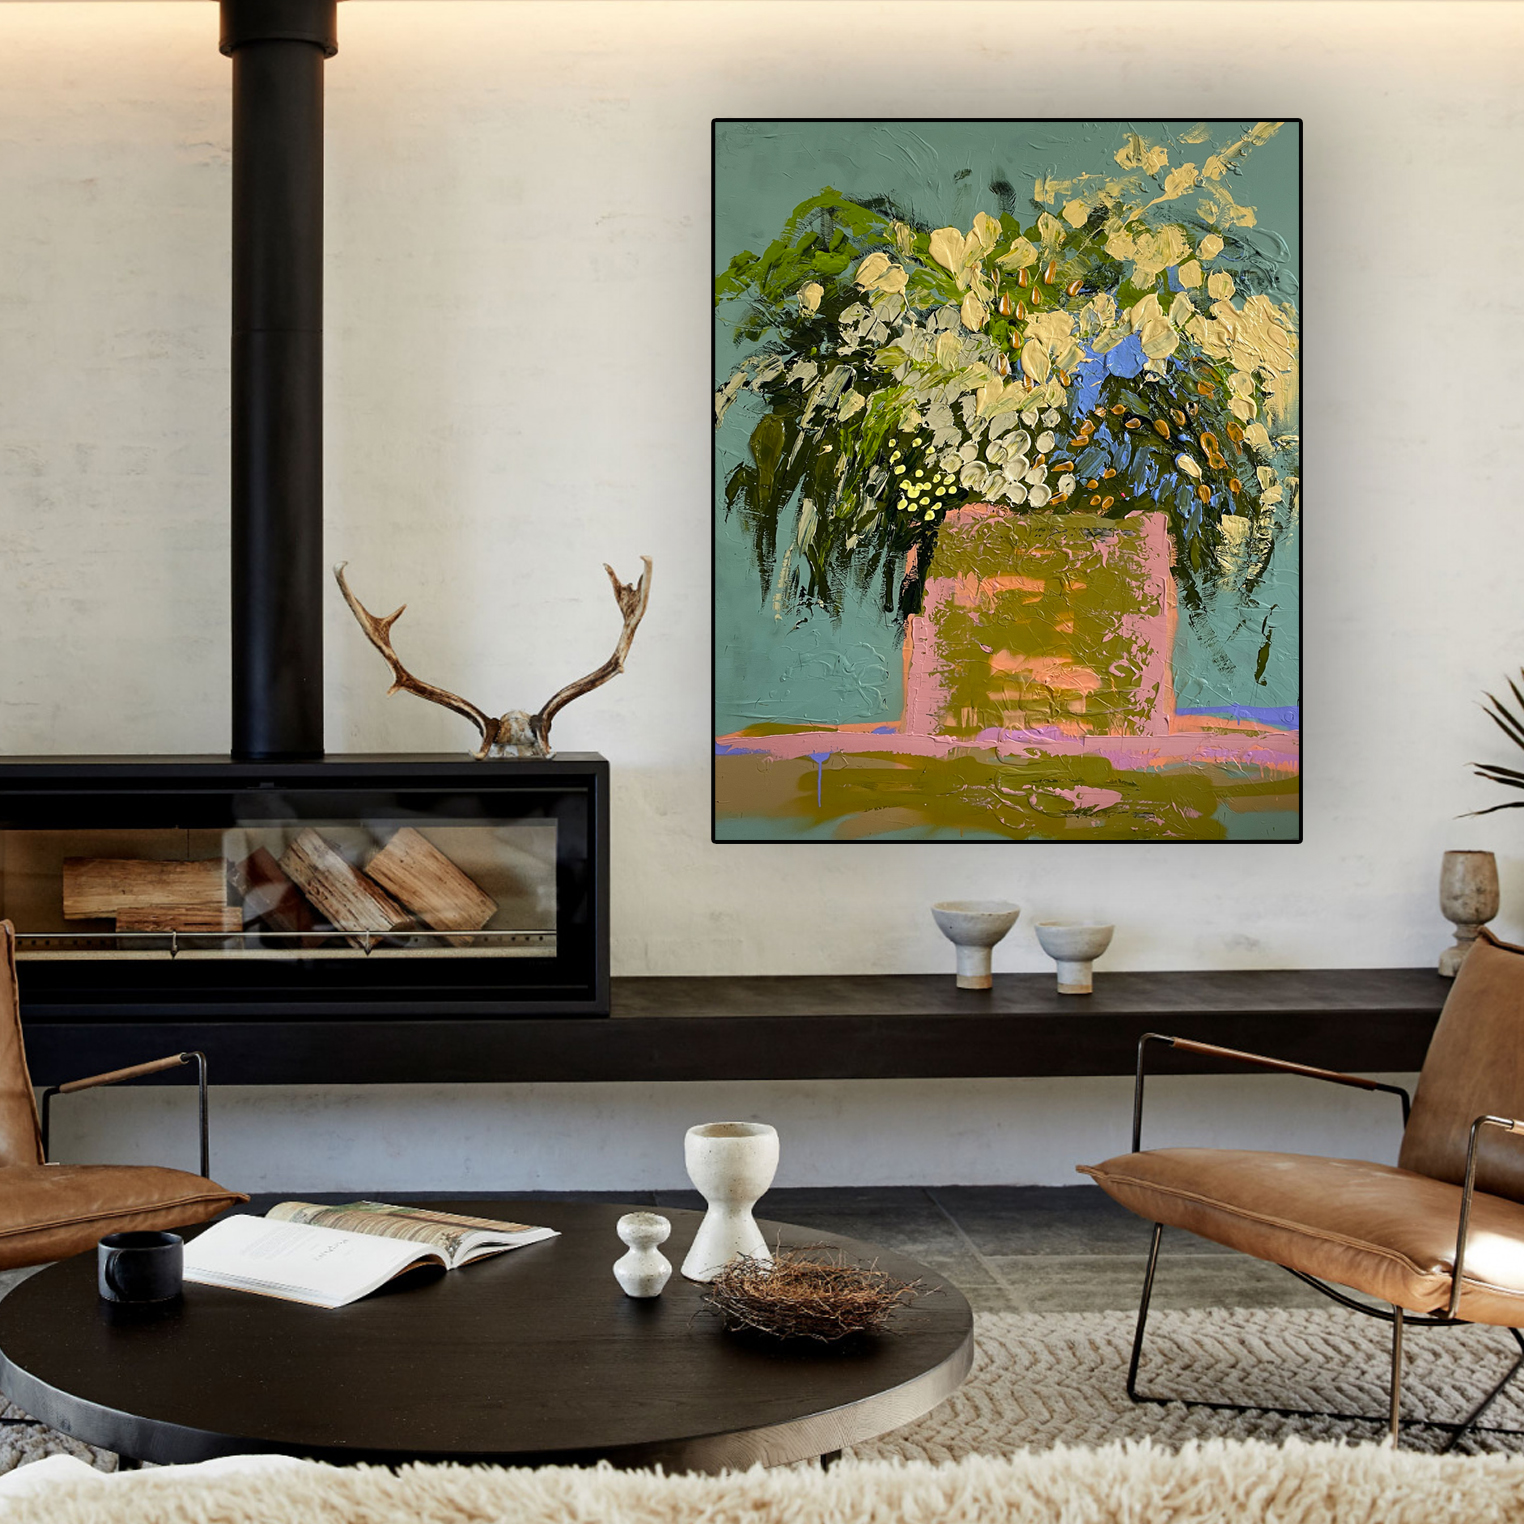 Original artworks Australia 'Home Among the Gum Trees' Baker Collection